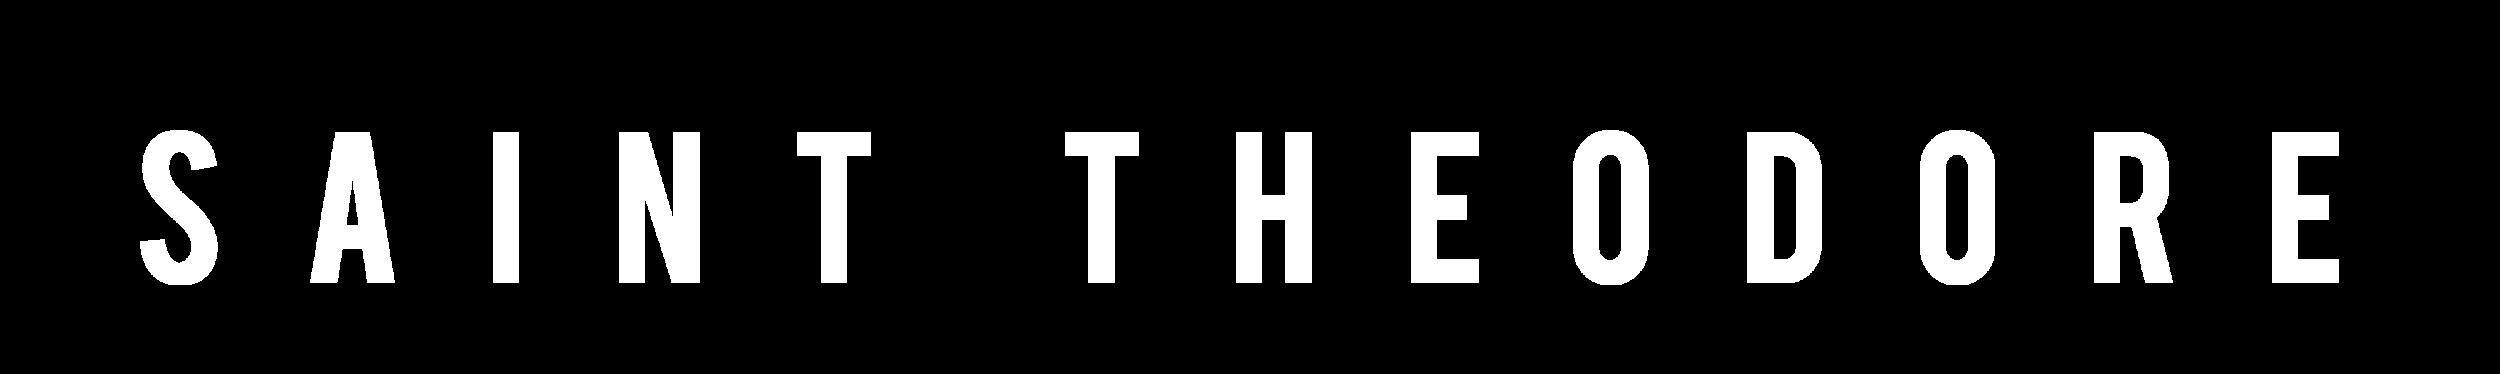 Saint Theodore logo white.png